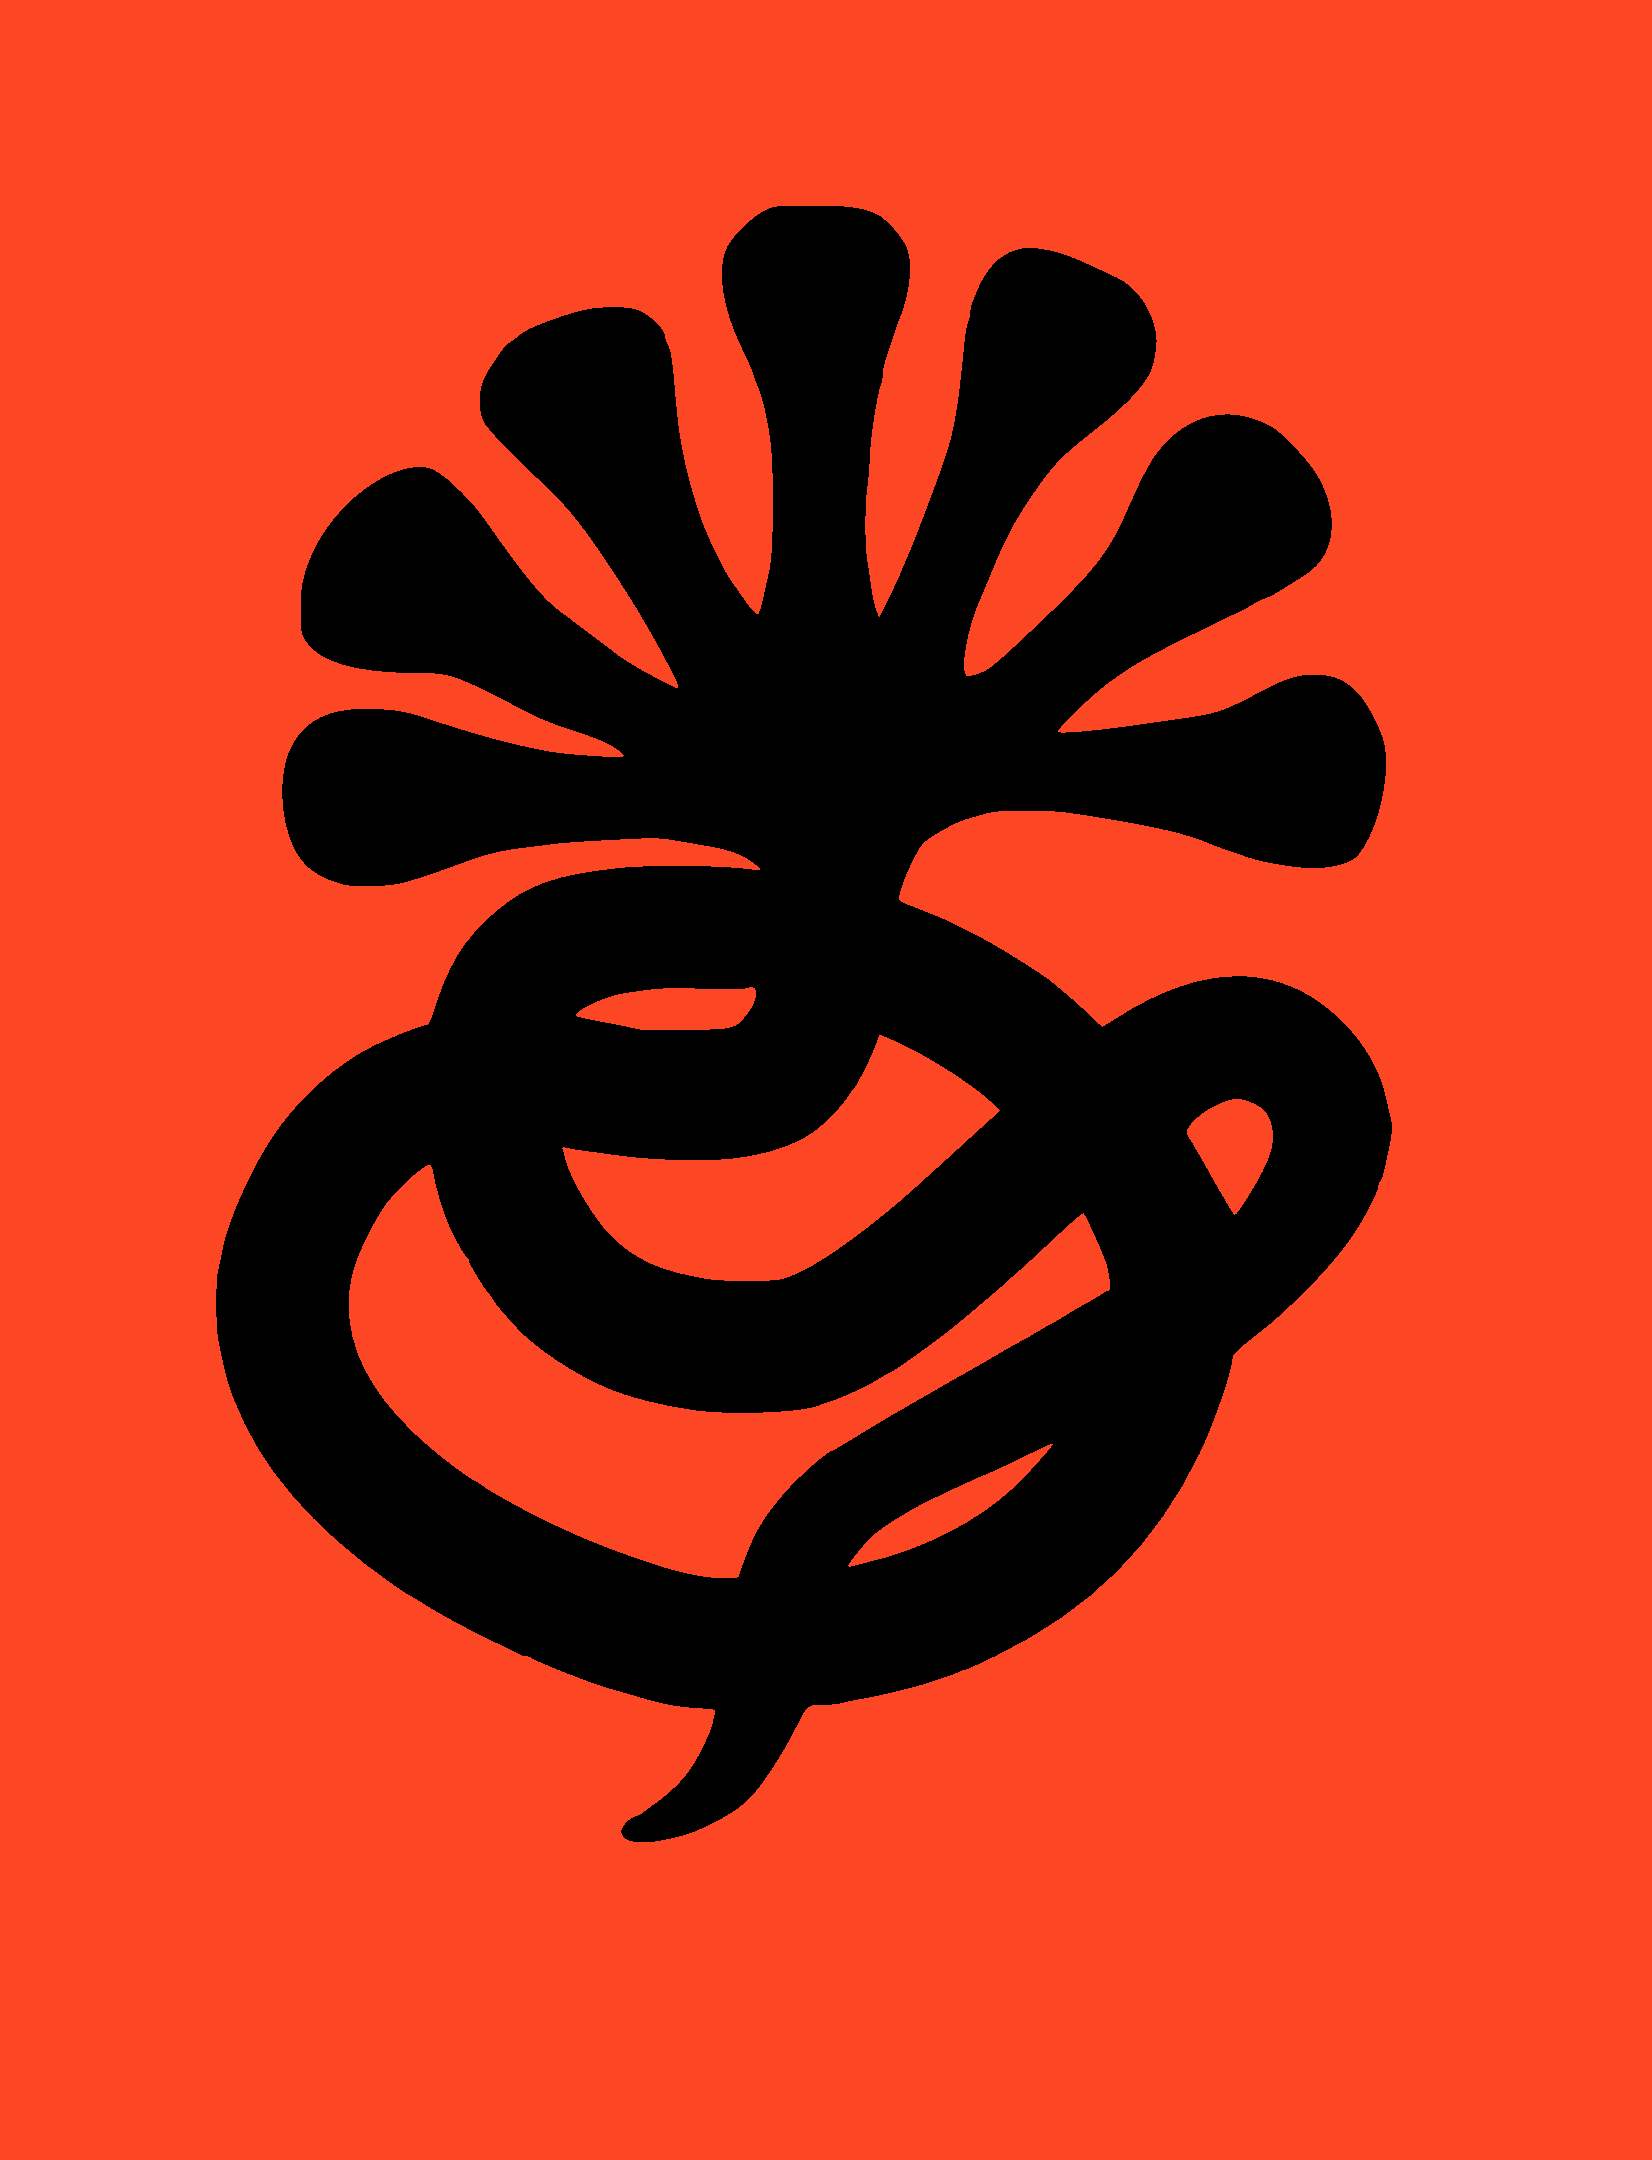 Kwanzaa Seven Principles Poster 24 x 18 Style 4   Etsy   2160x1652